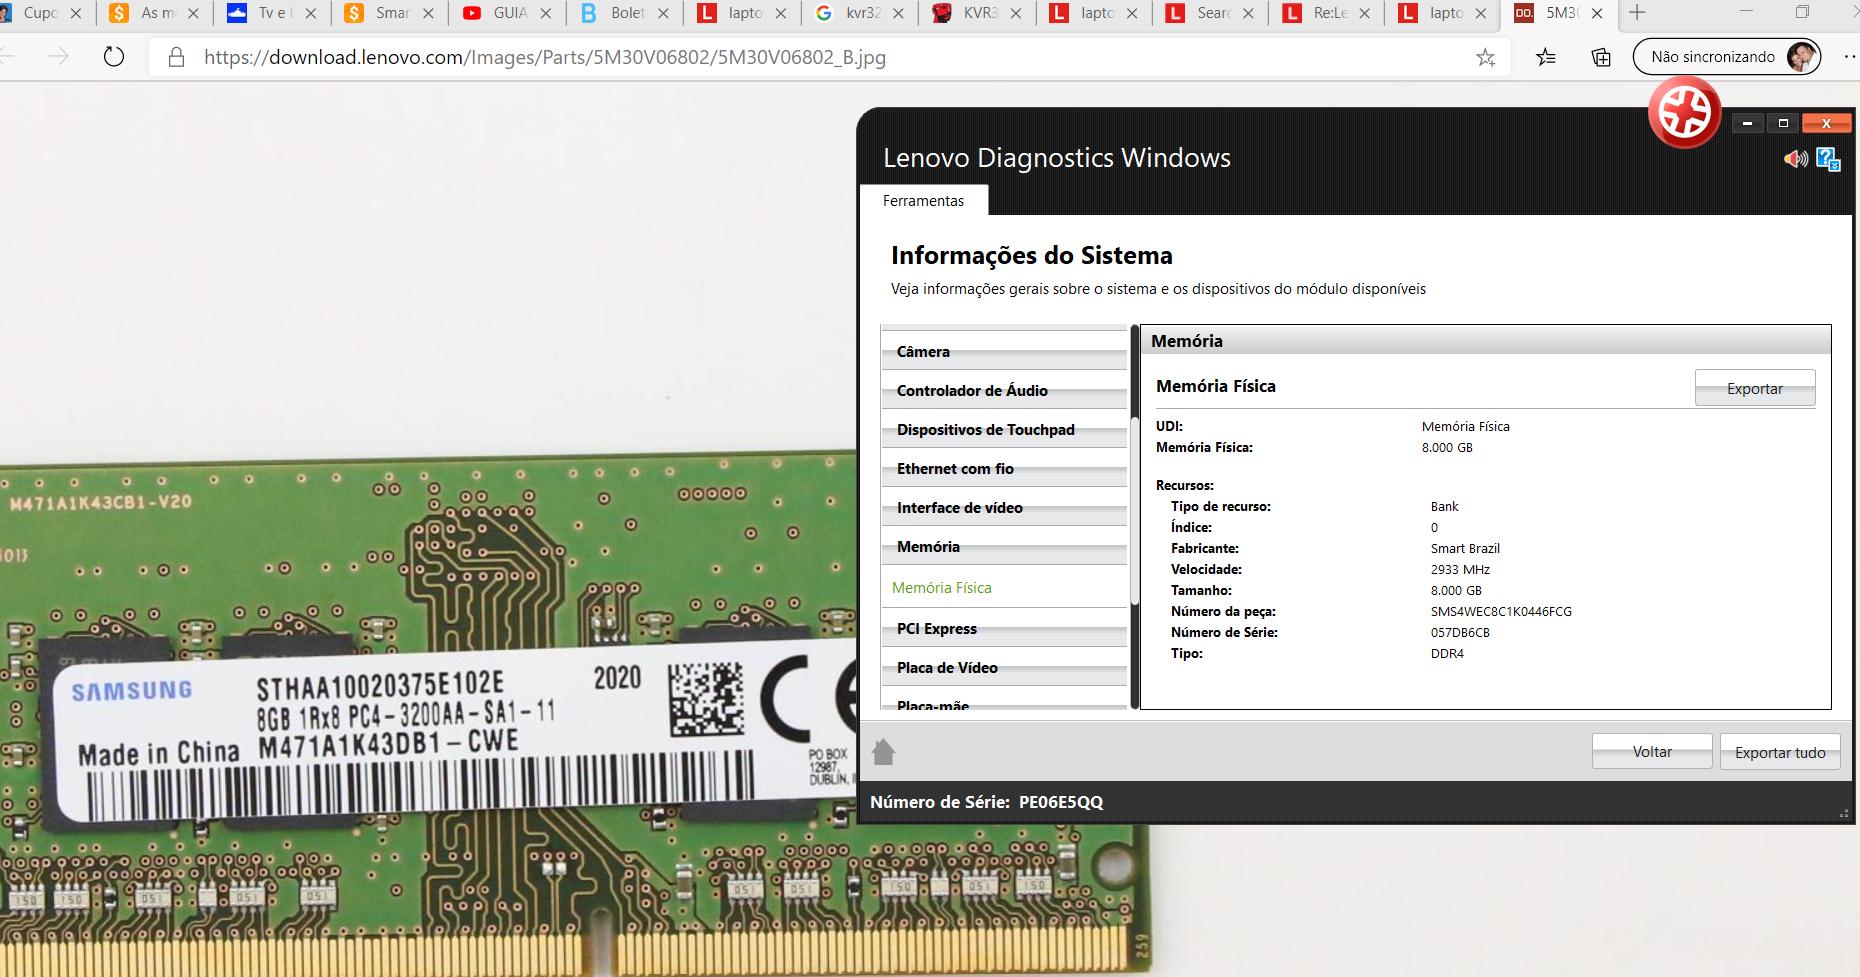 RAM DDR 3200mhz